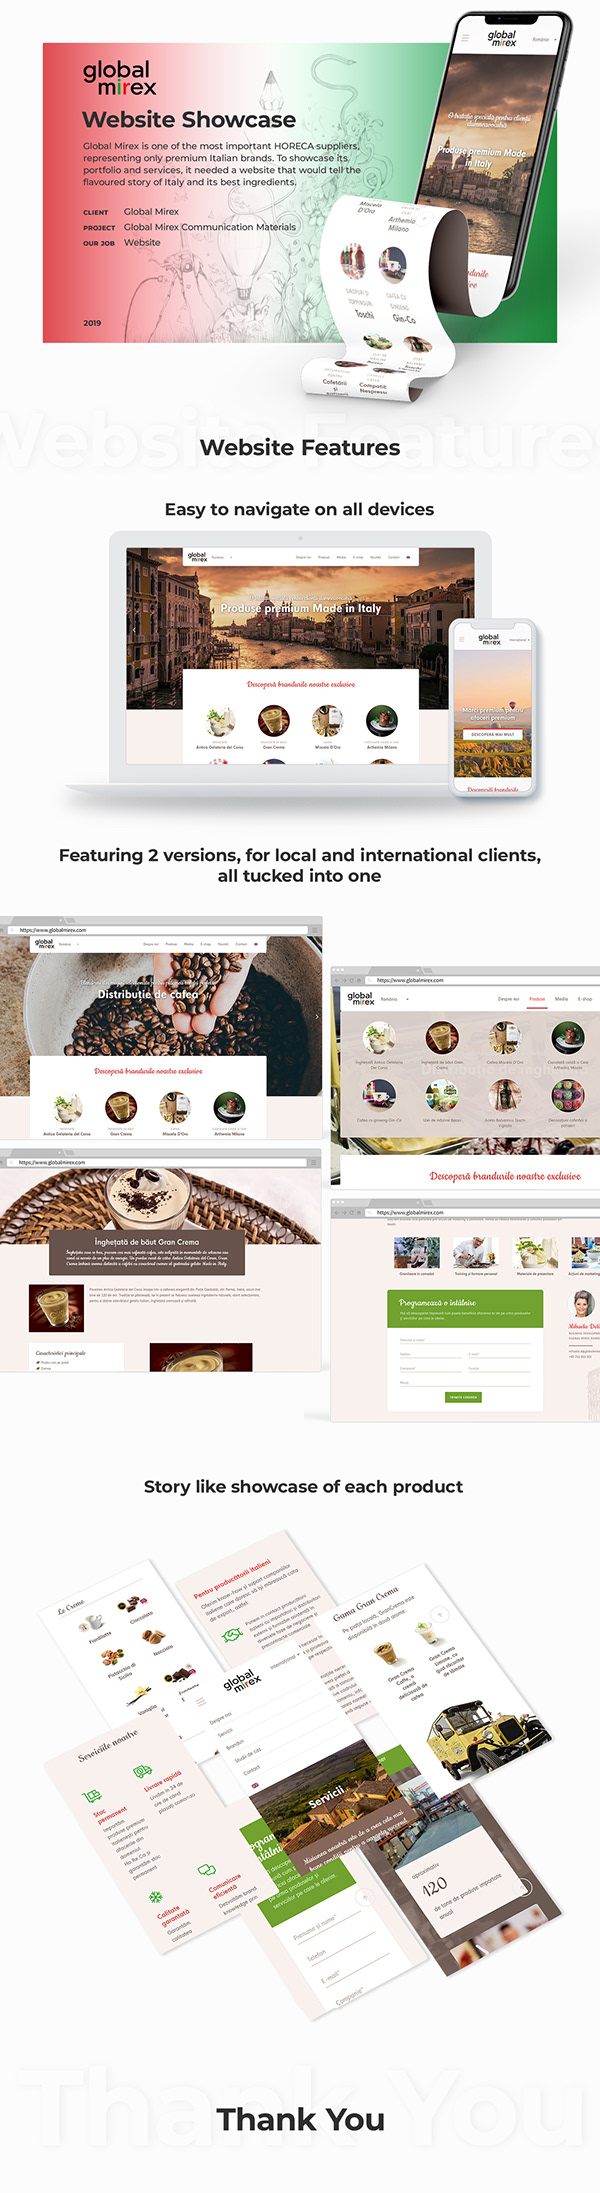 Global Mirex - Website Showcase